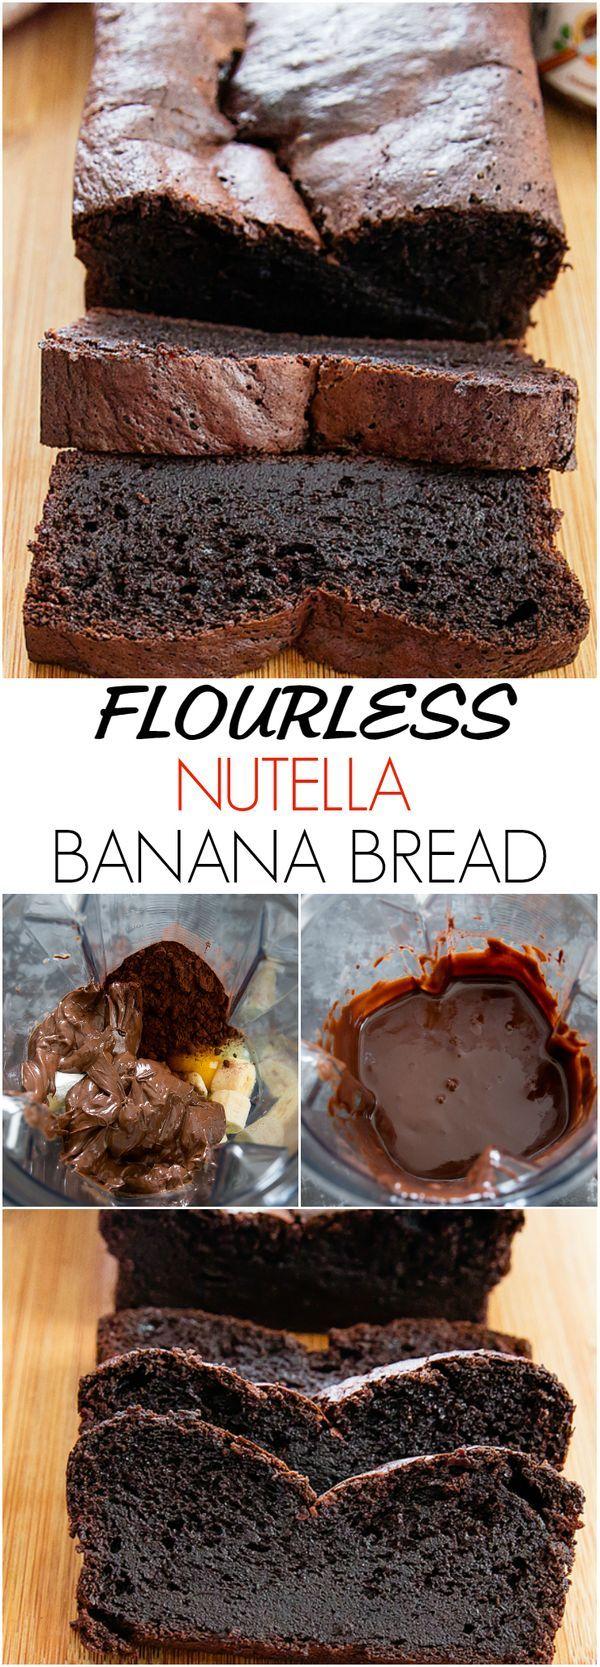 Flourless Nutella Banana Bread